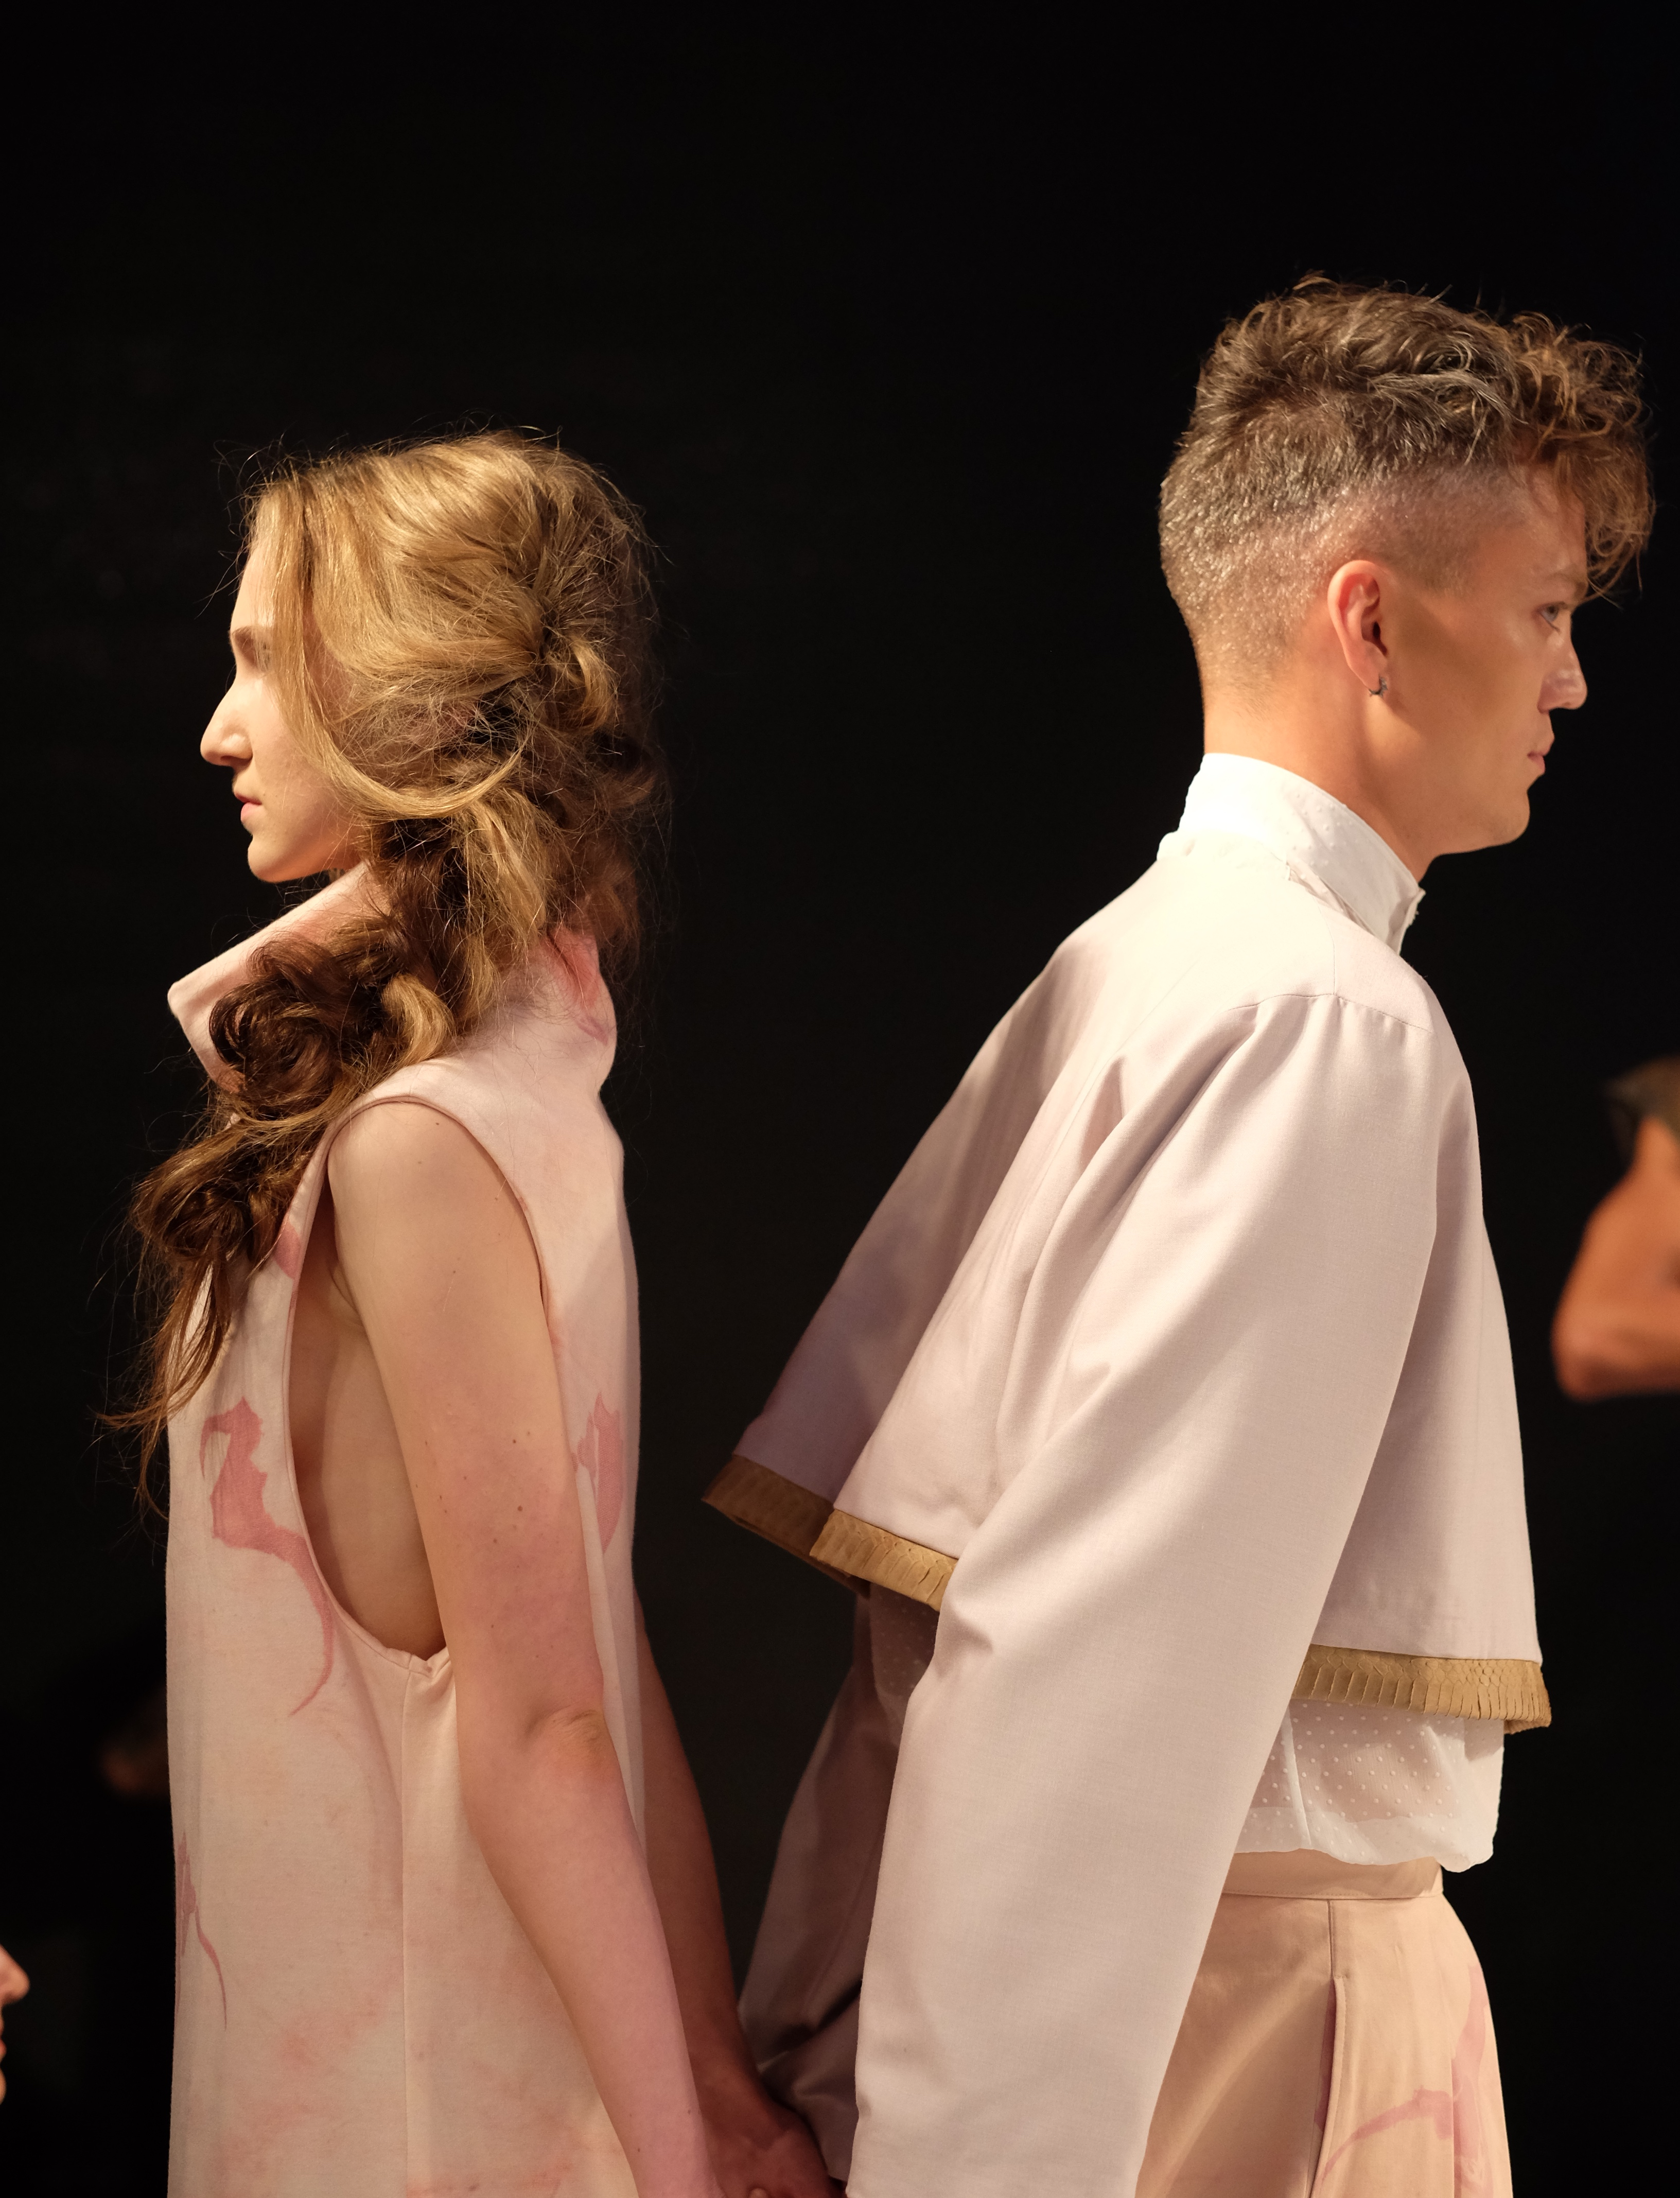 LAFW S/S17 Designer: Rickyy Wong Lead Hair: Luxelab Bel Air Stylists Timothy Ro Photo: Liz Abrams